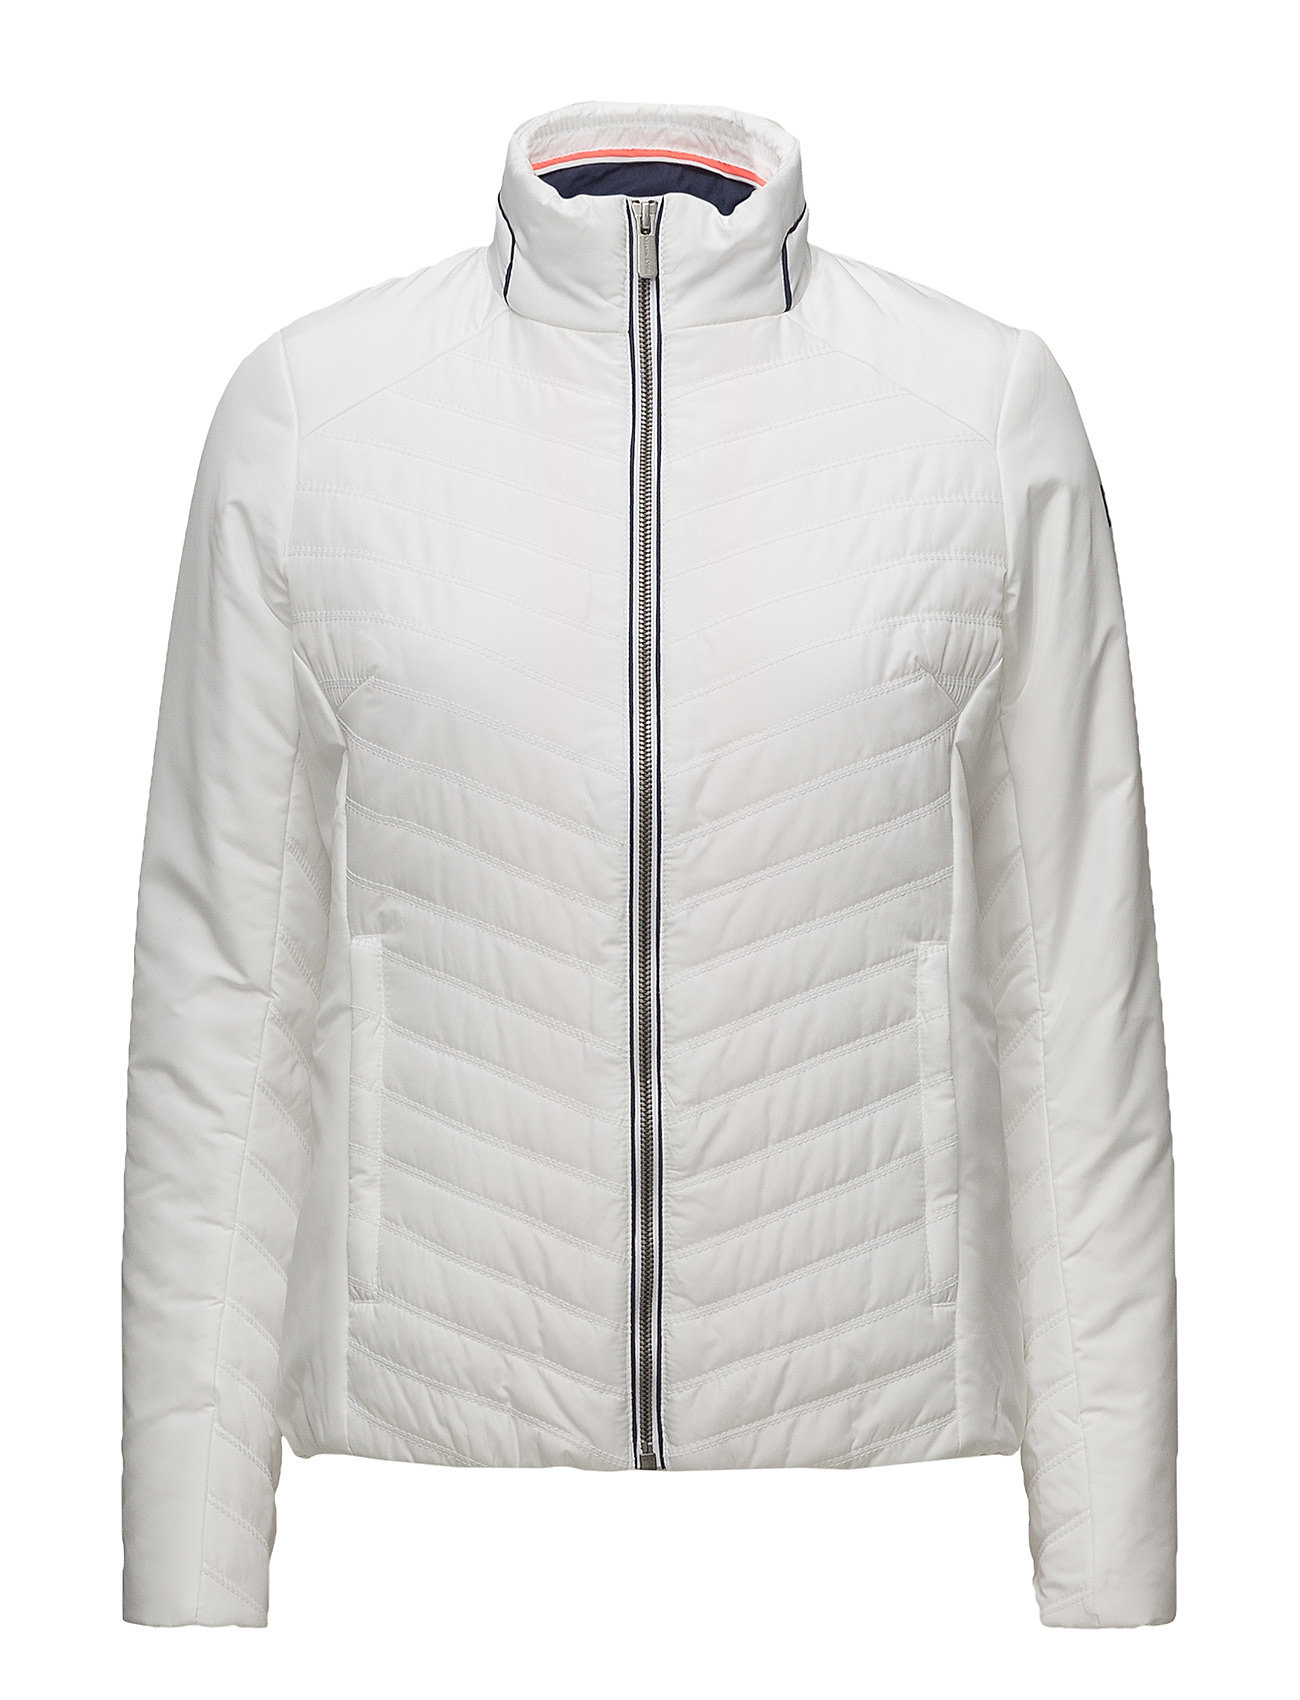 W Crew Insulator Jacket Helly Hansen Sportsjakker til Kvinder i hvid